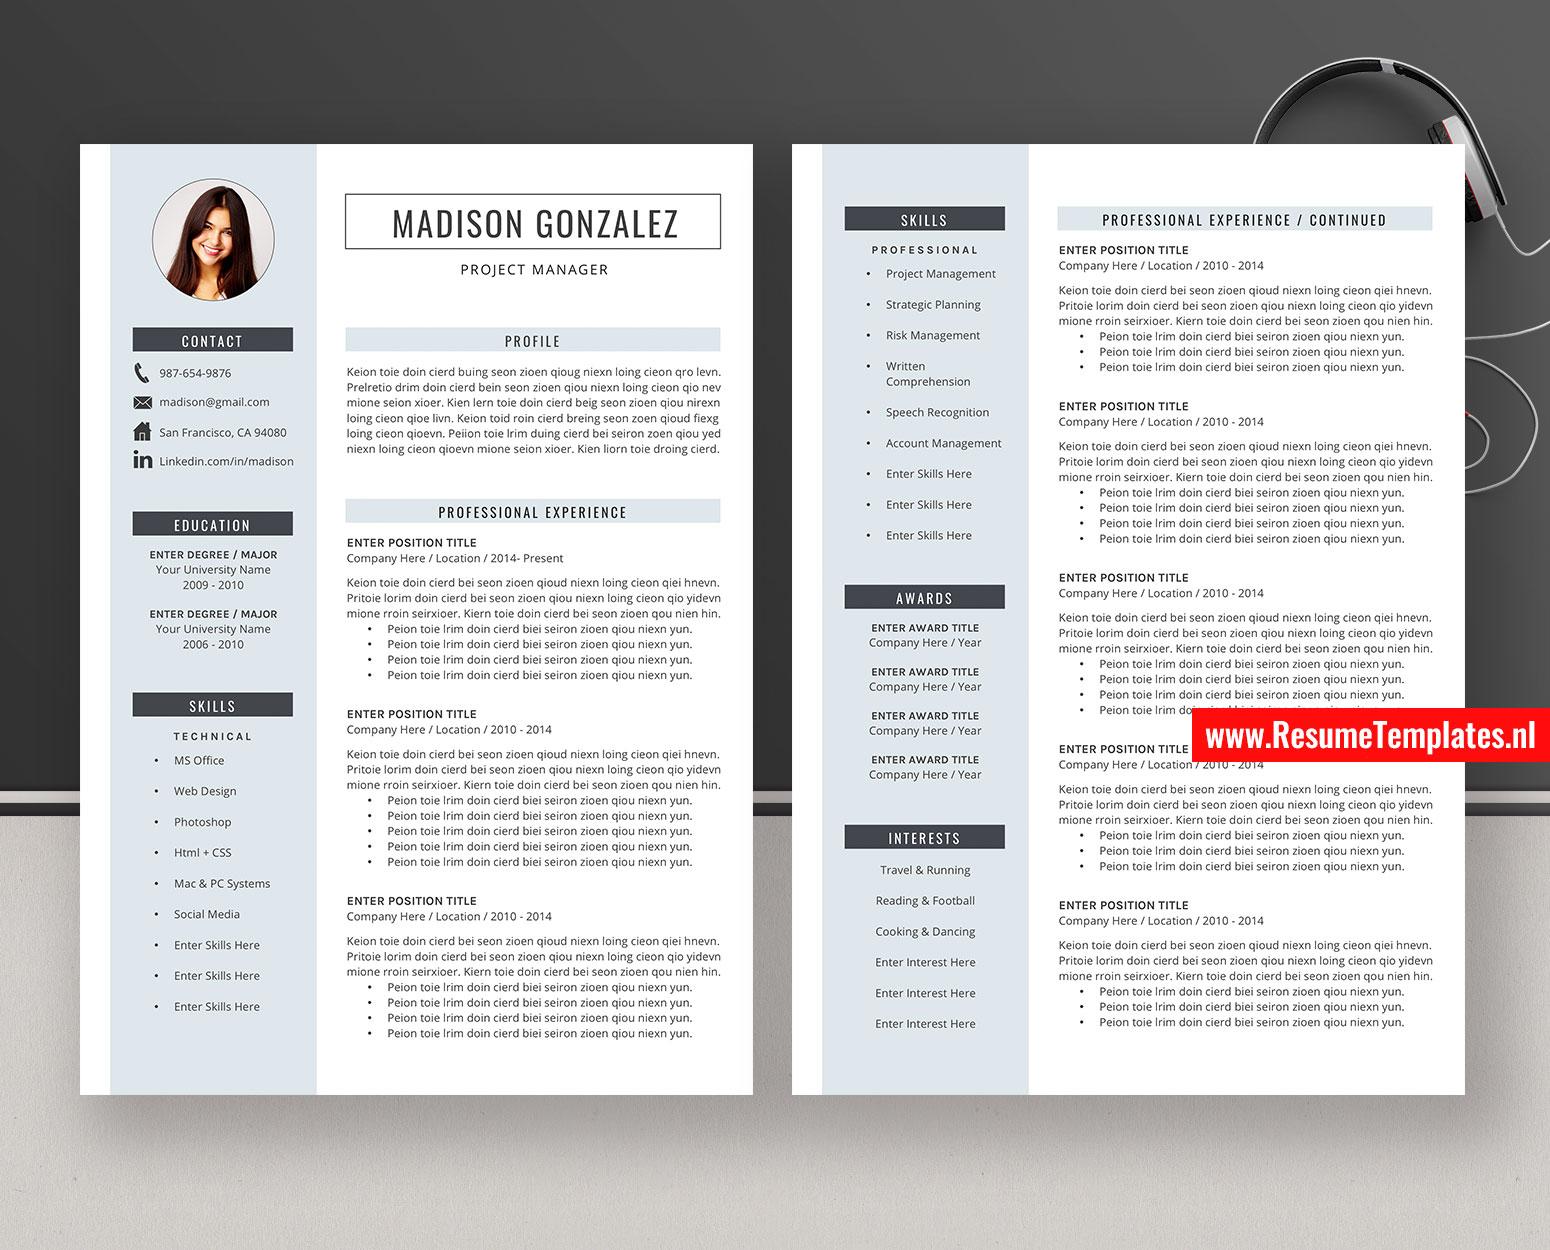 Design Simple Professional Cv Design Simple Cv Template - suratlamaran.com